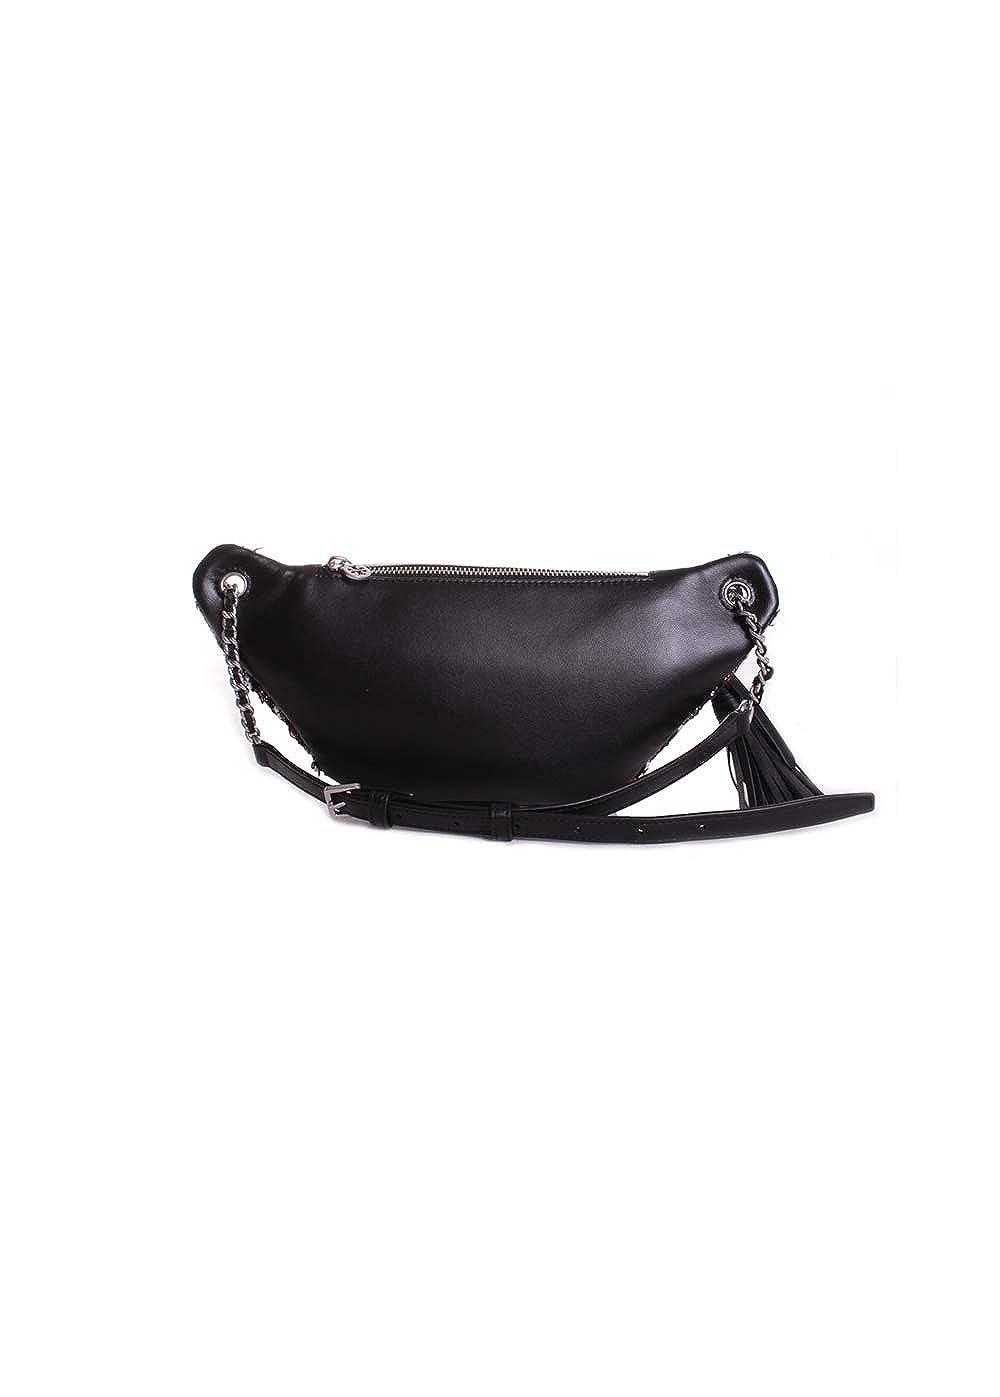 e448810be9d7 Amazon.com  Tory Burch Fleming Tweed Belt Bag in Boucle Lurex Tweed   Clothing